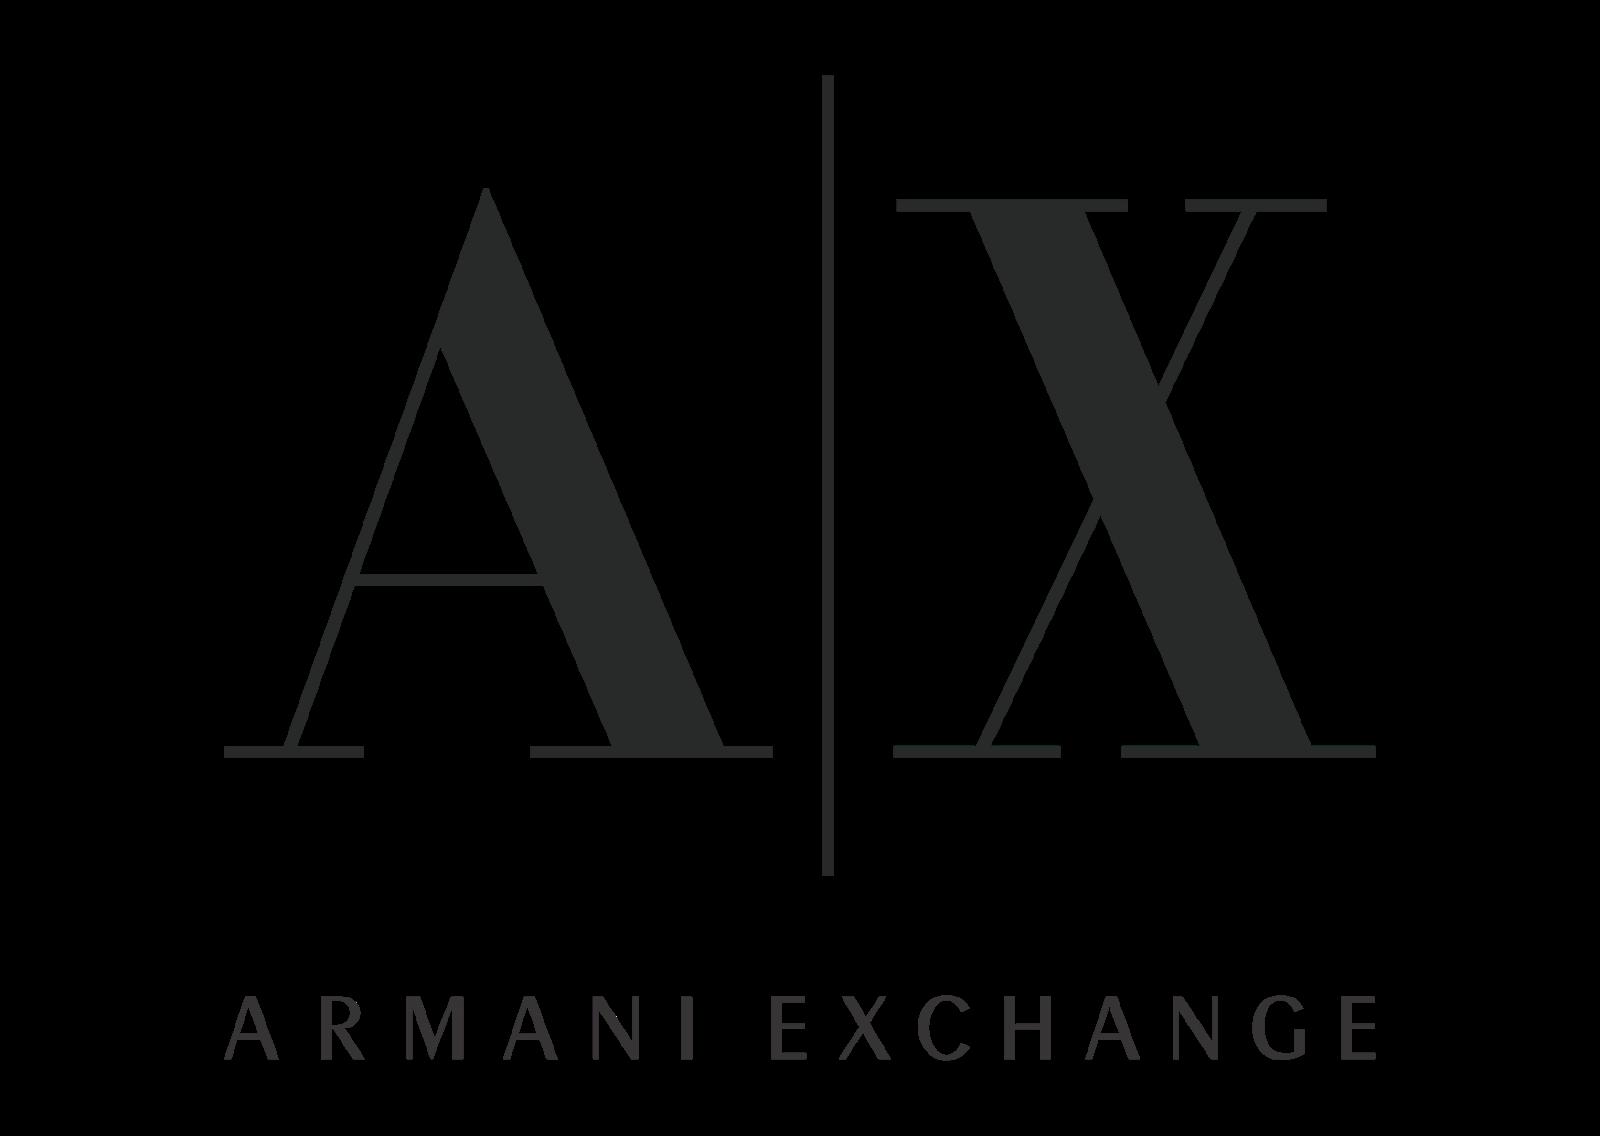 Armani exchange Logo Vector download free